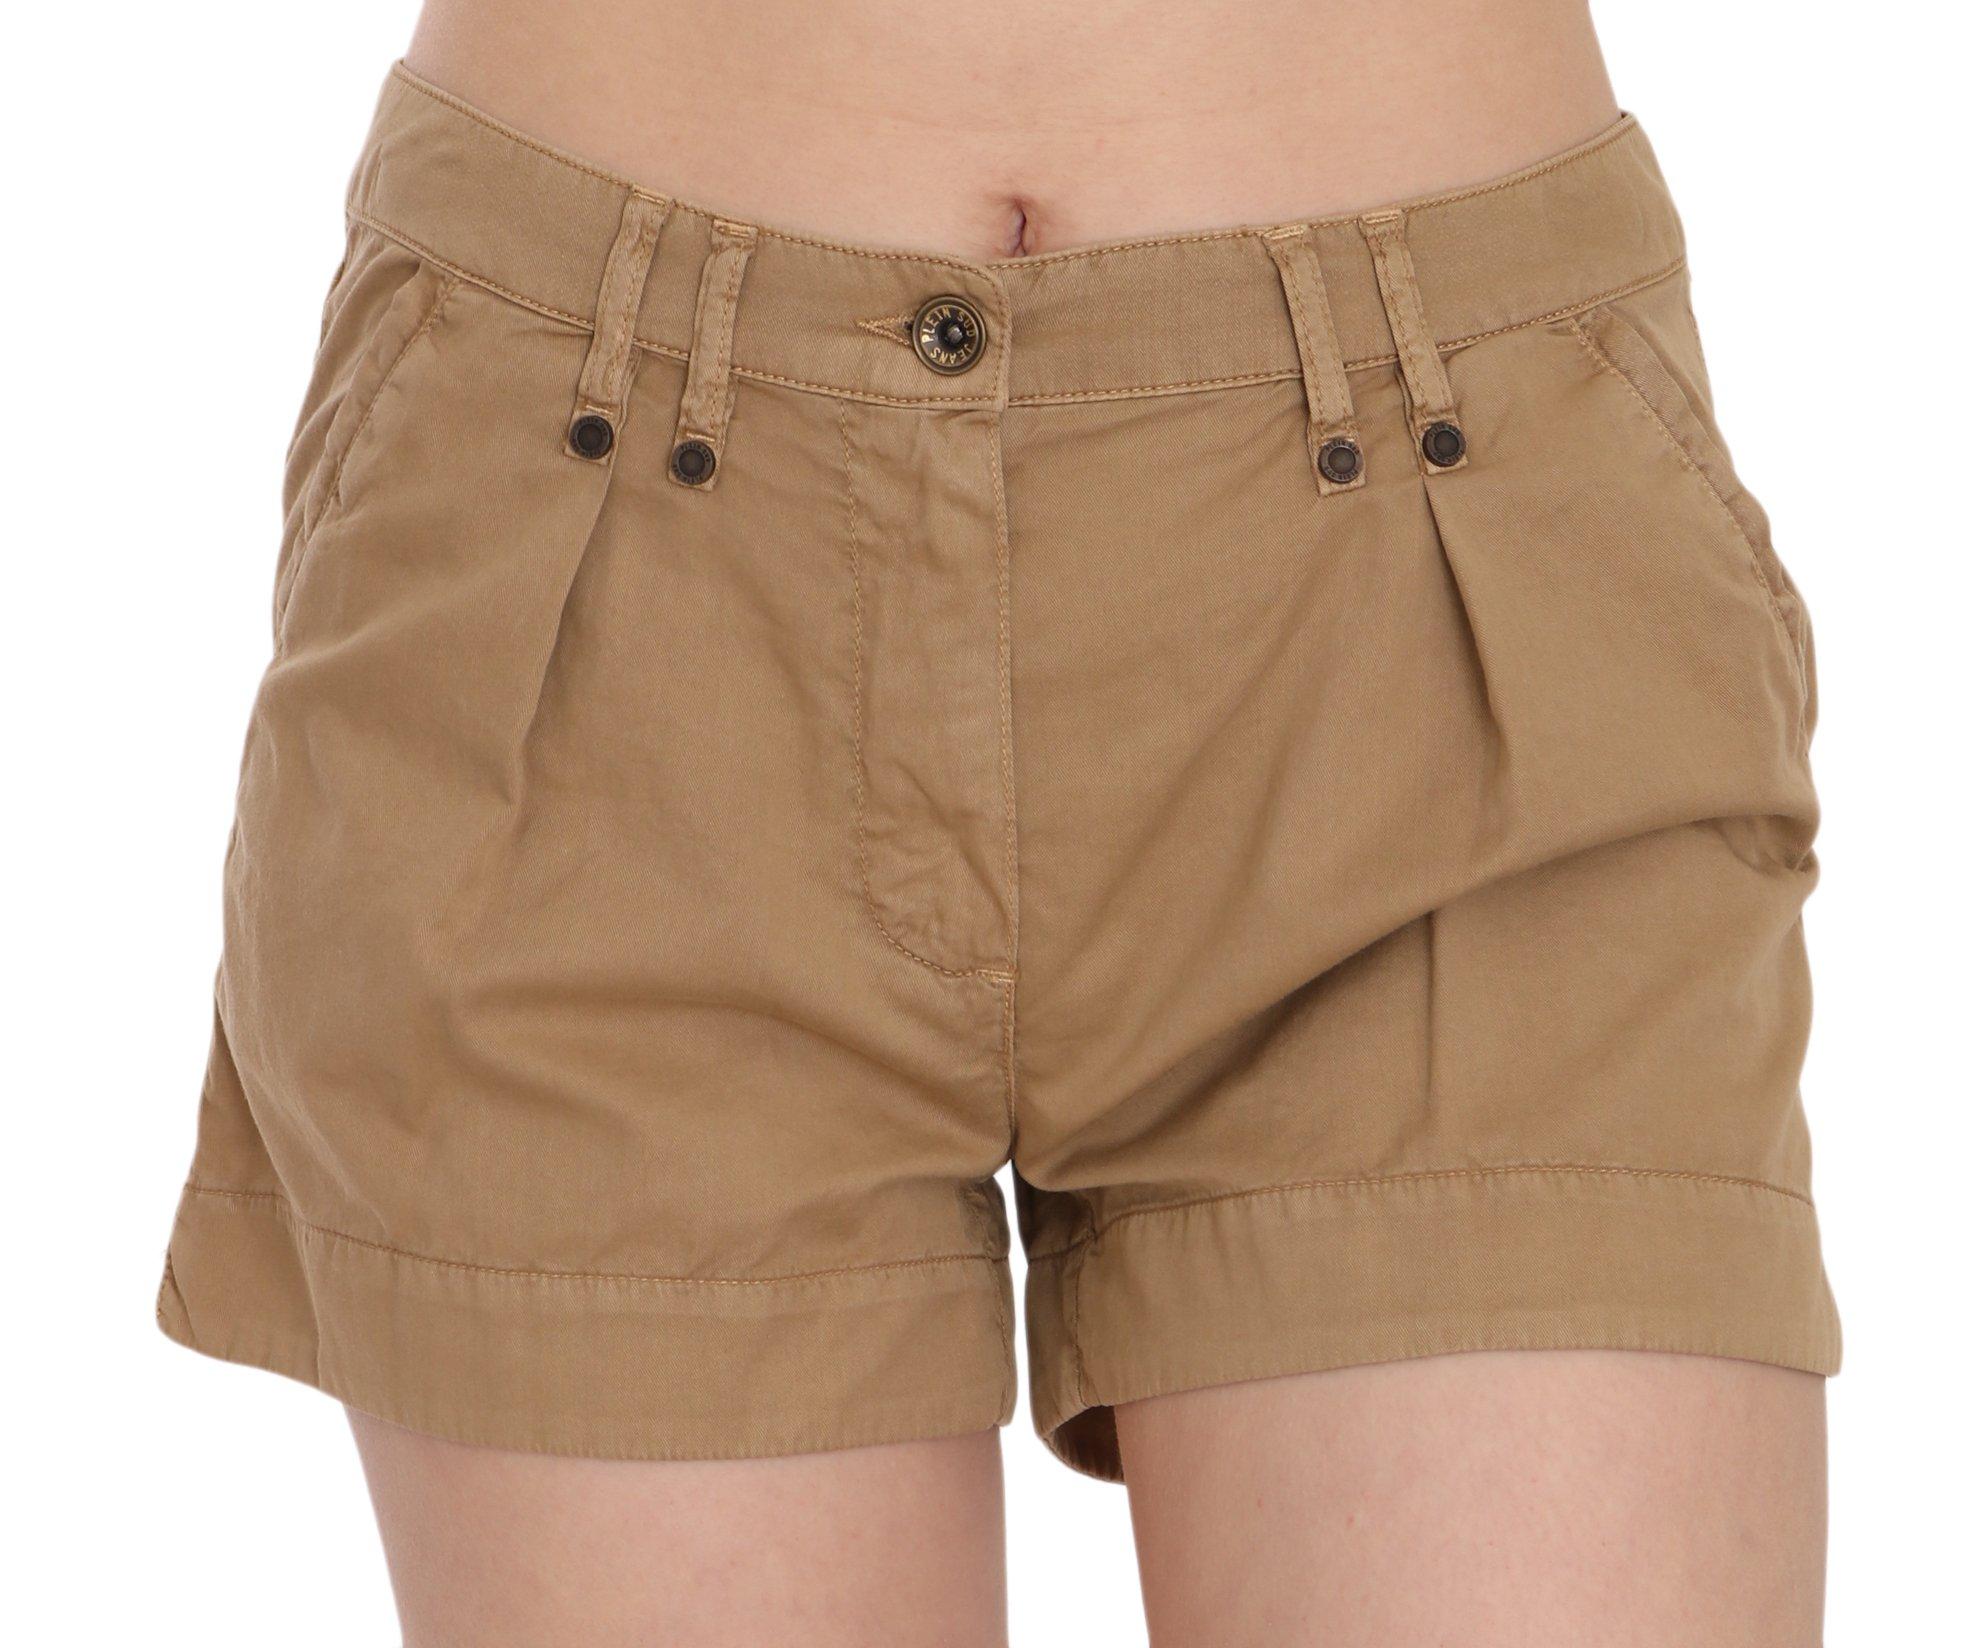 PLEIN SUD Women's Mid Waist Cotton Mini Shorts Brown PAN70244 - IT36   XS